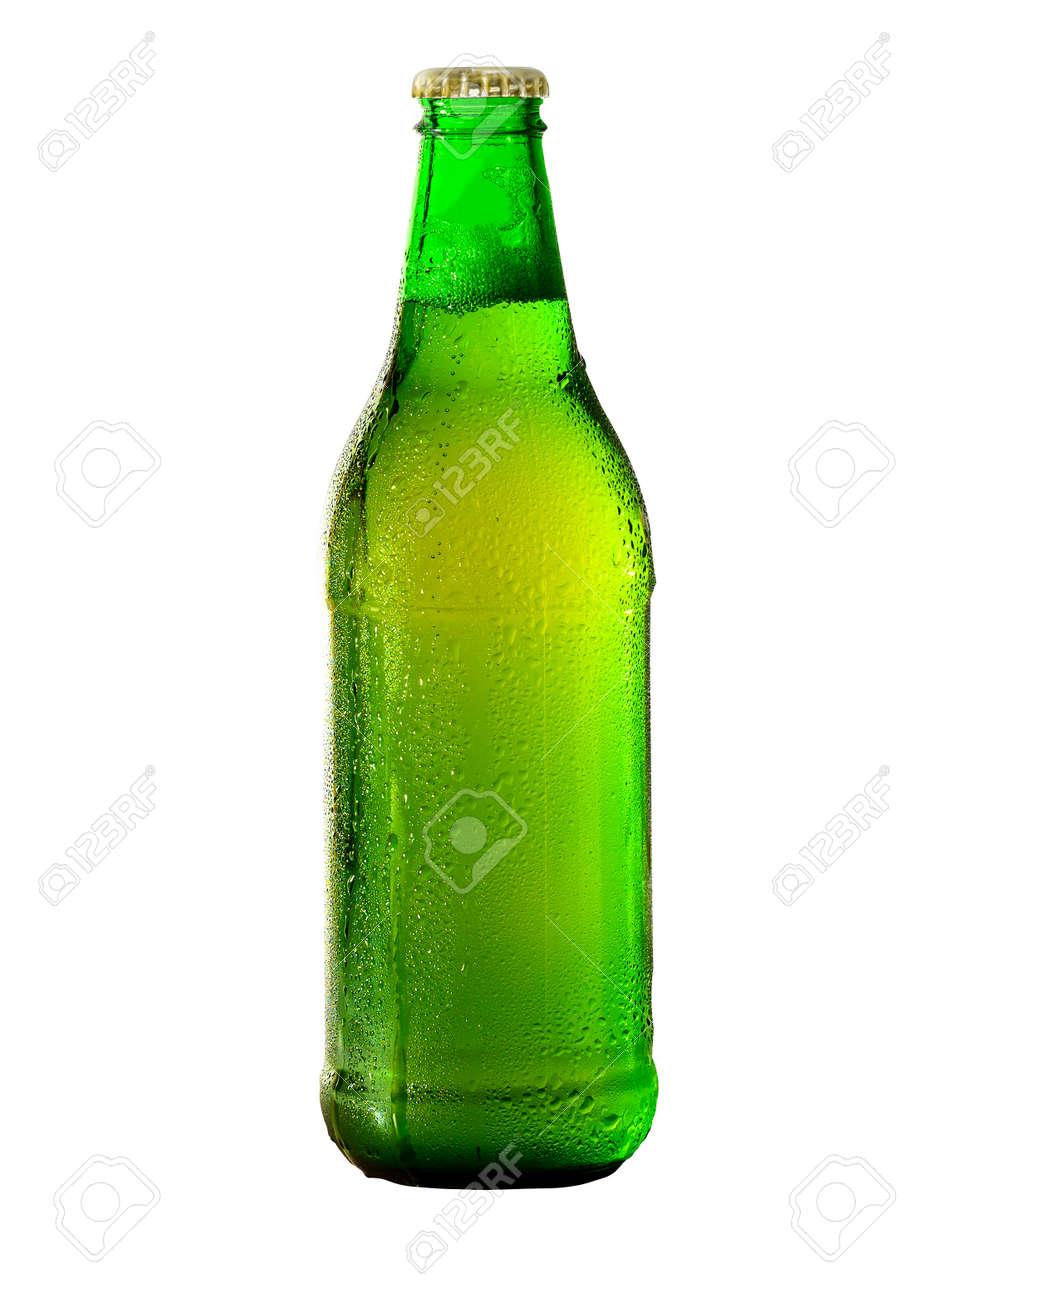 Green Beer bottle isolated on white. - 171169967